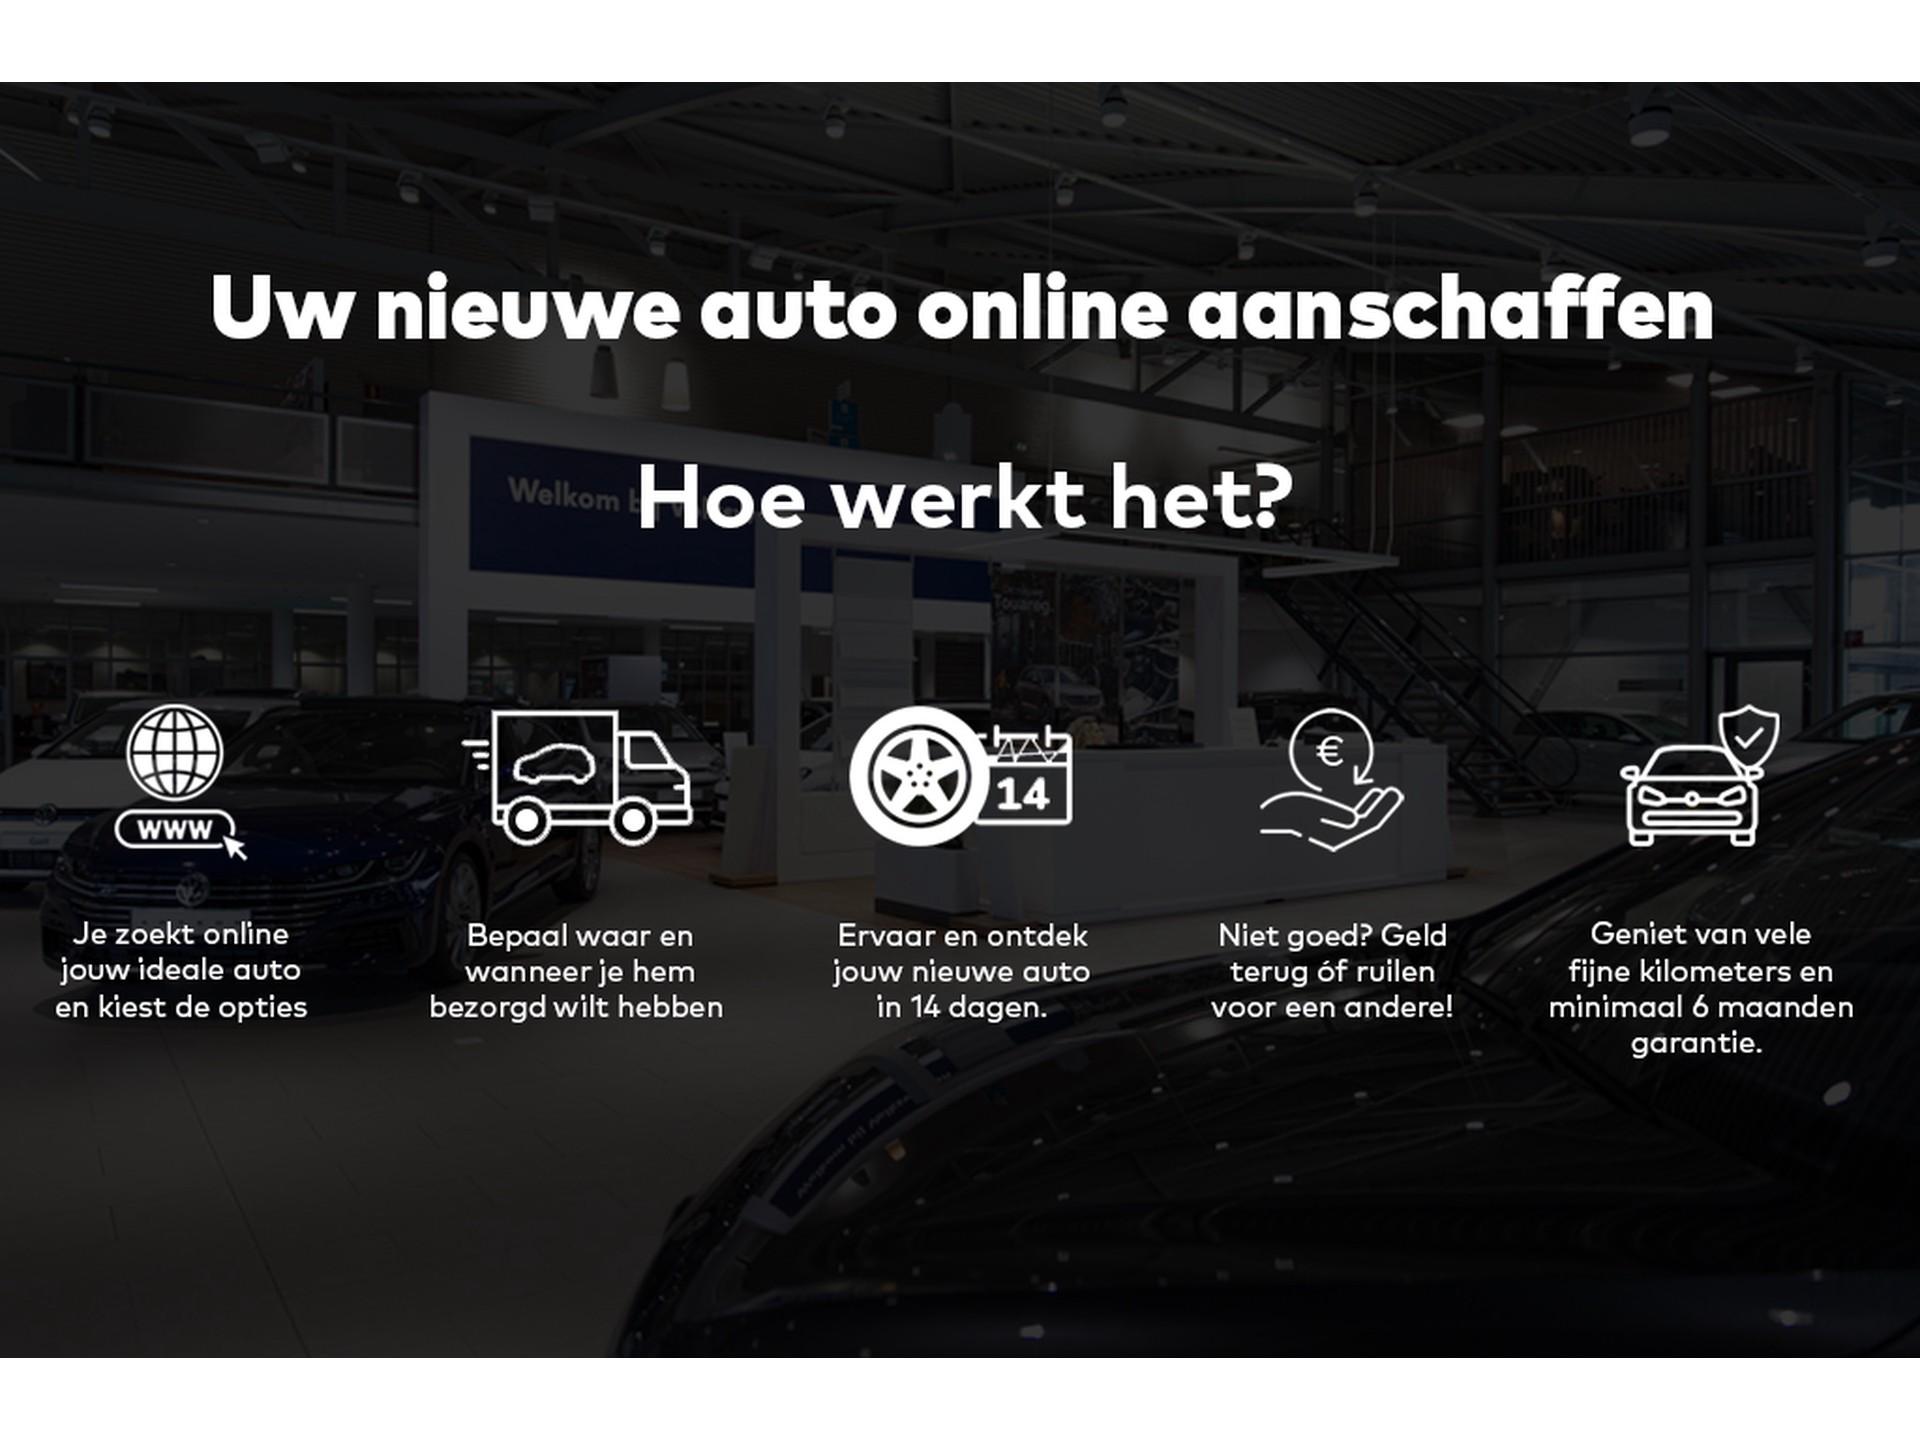 Audi - A5 Sportback 35 TFSI 150pk S-Line - 2020